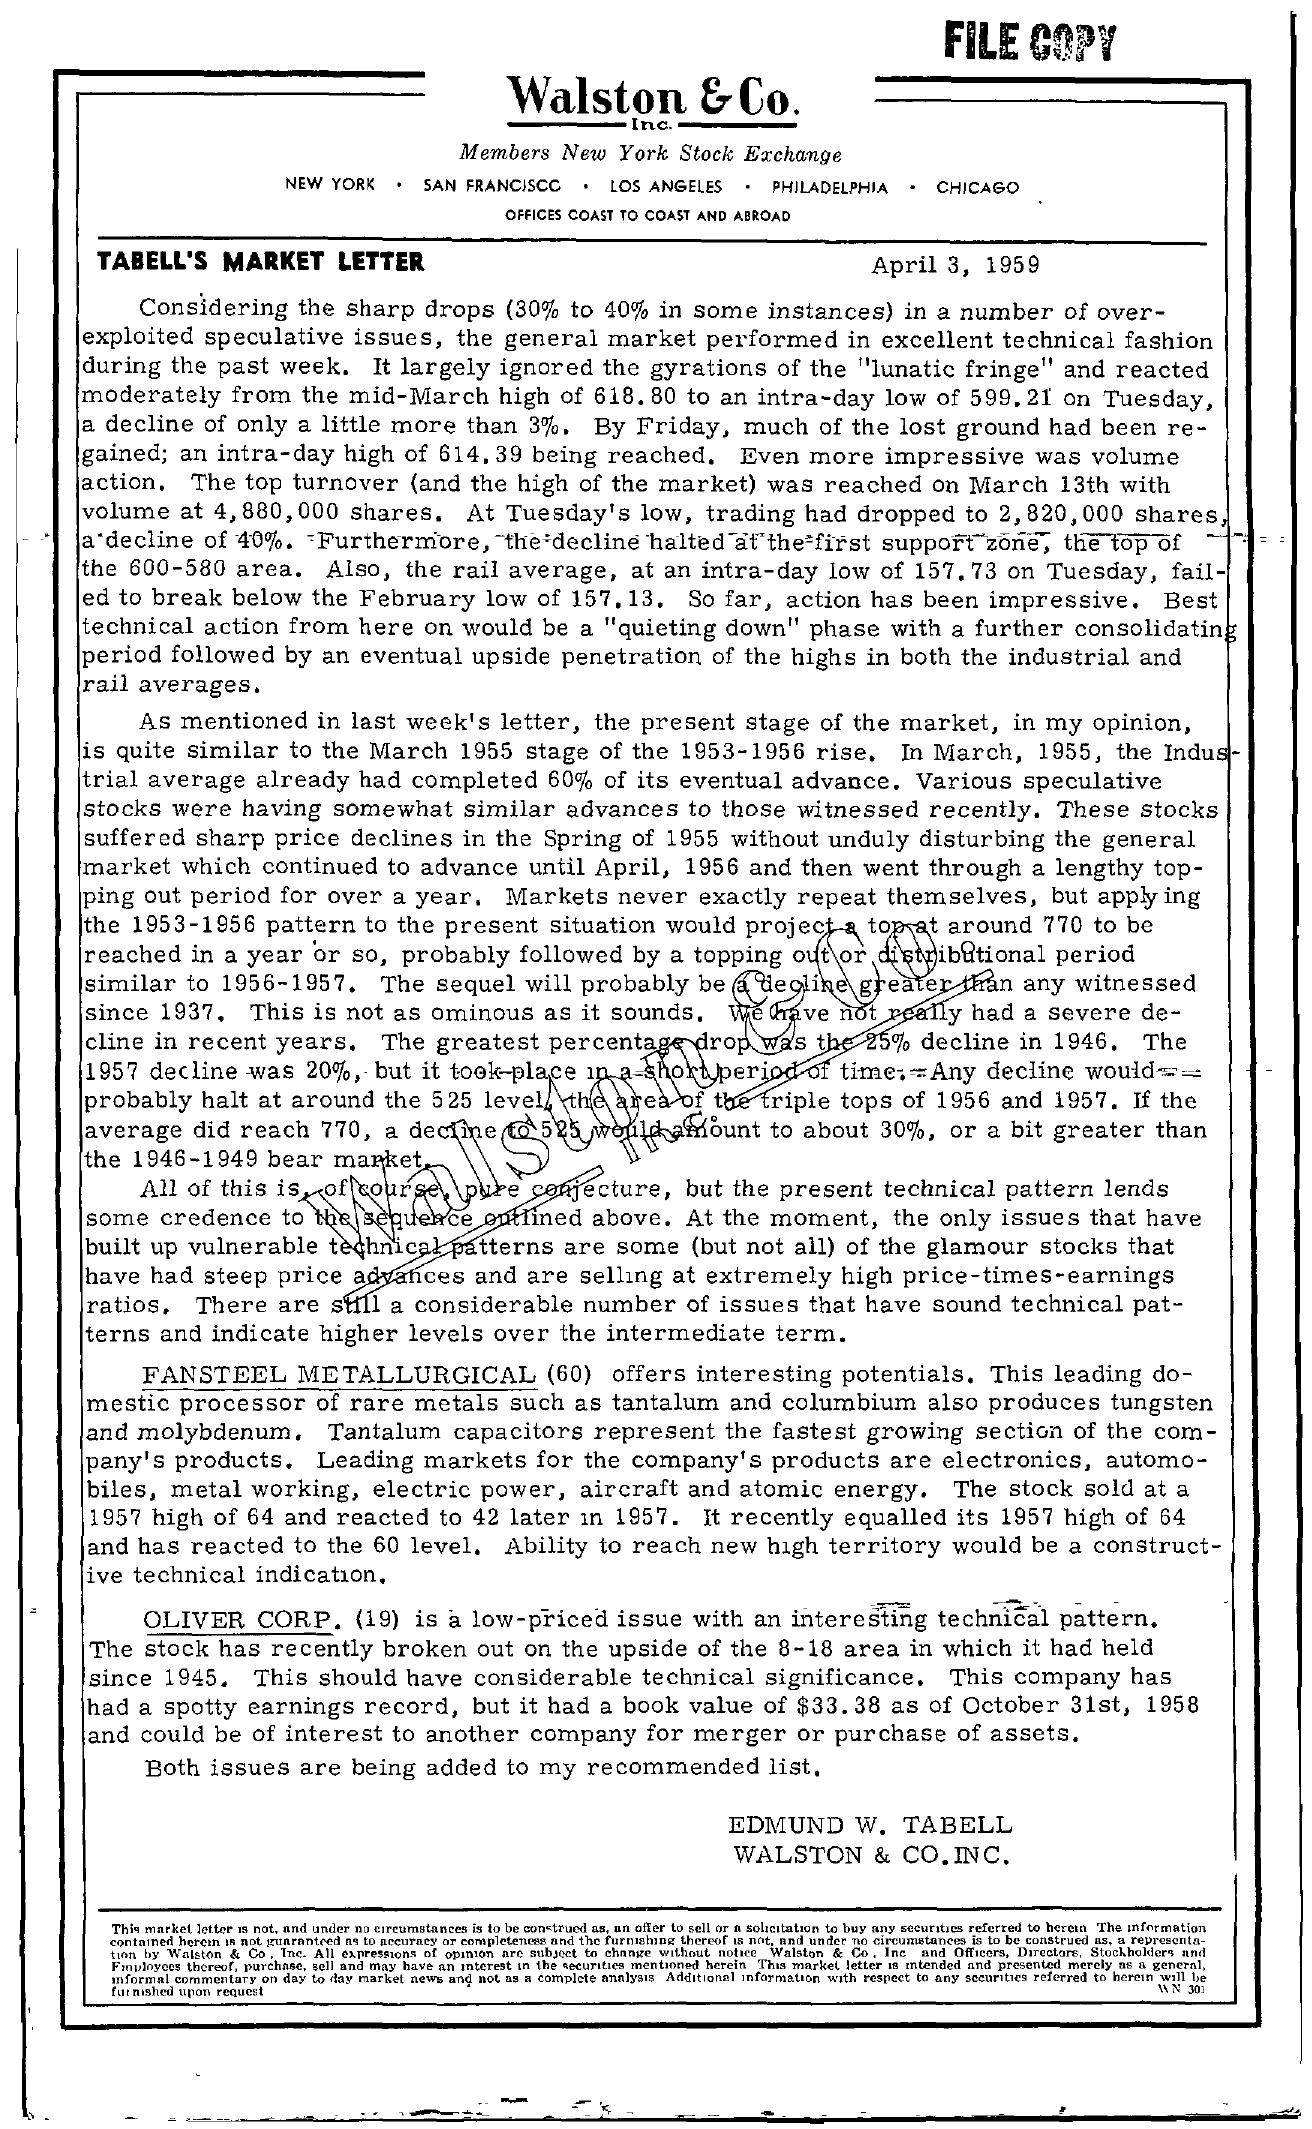 Tabell's Market Letter - April 03, 1959